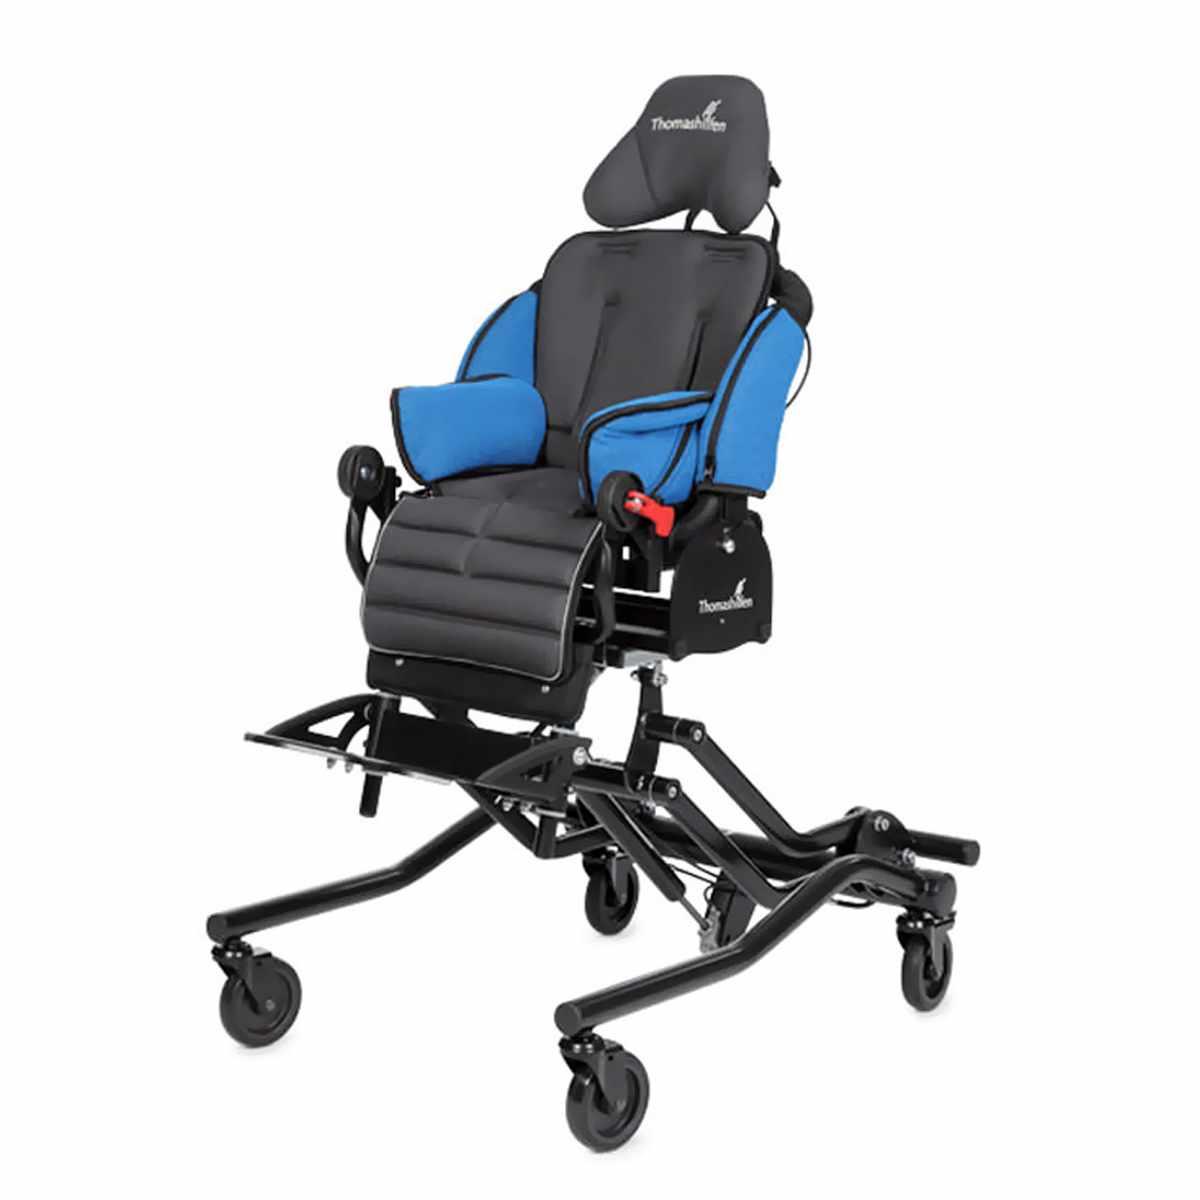 Thomashilfen EASyS modular S seating system